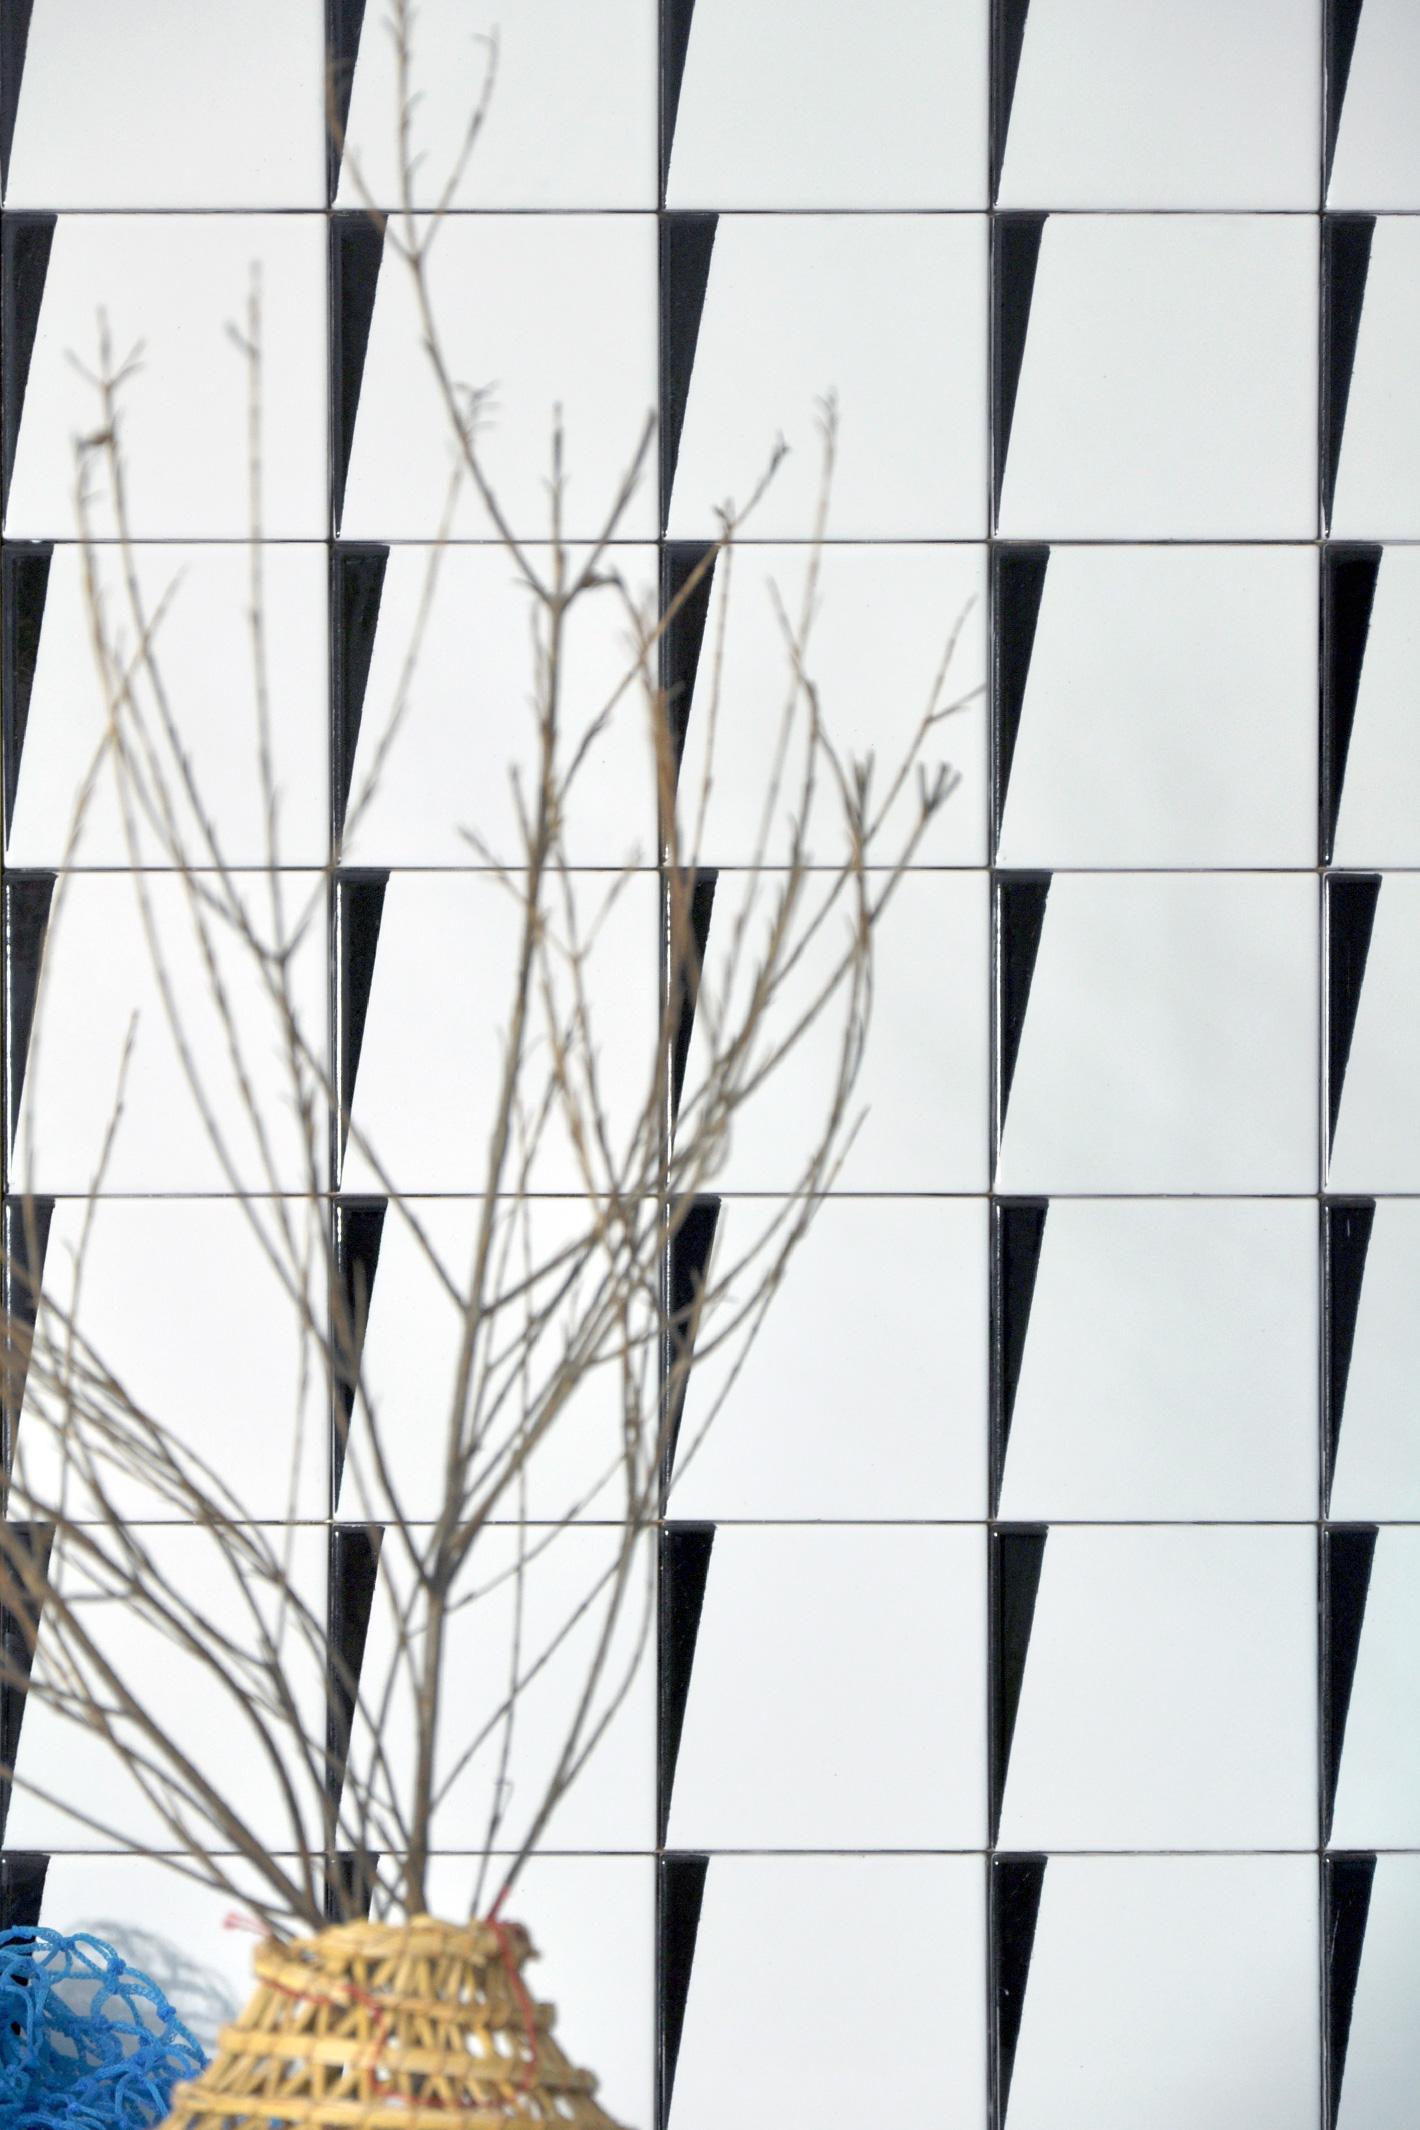 piastrelle / tiles CUNEI - Studiocharlie - Made a Mano - Carla scorda - Gabriele Rigamonti - Vittorio Turla